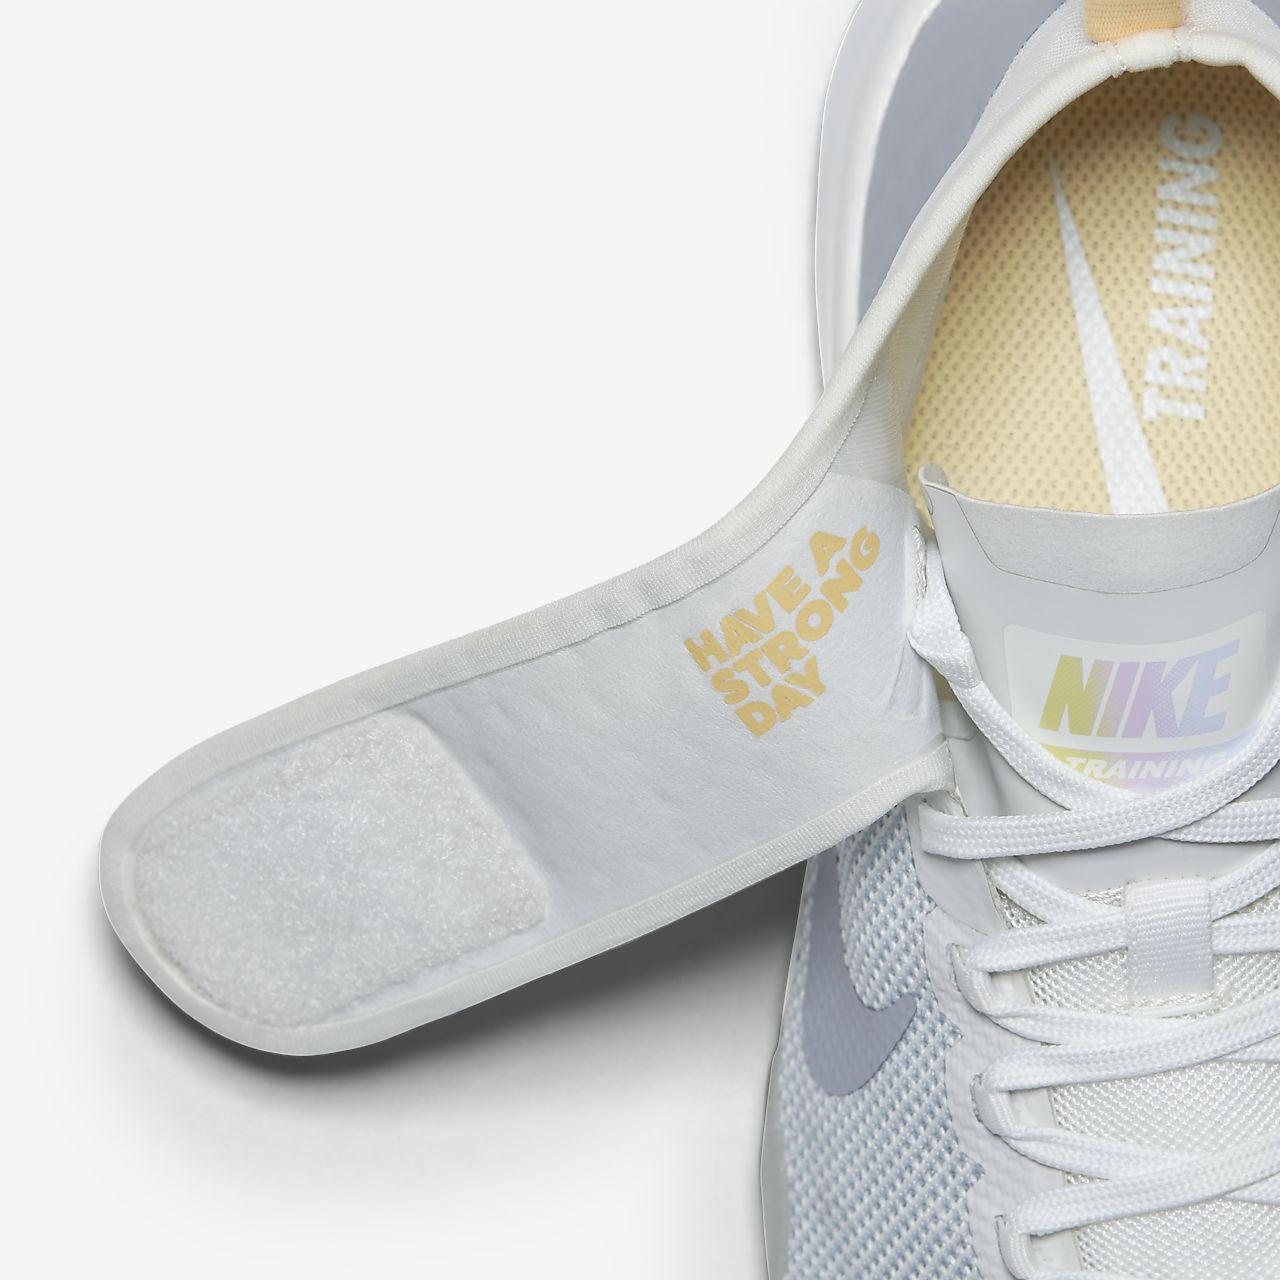 Nike Air Zoom Zoom Zoom Strong 2 Rise Damen-Trainingsschuh    | Zahlreiche In Vielfalt  280ab0